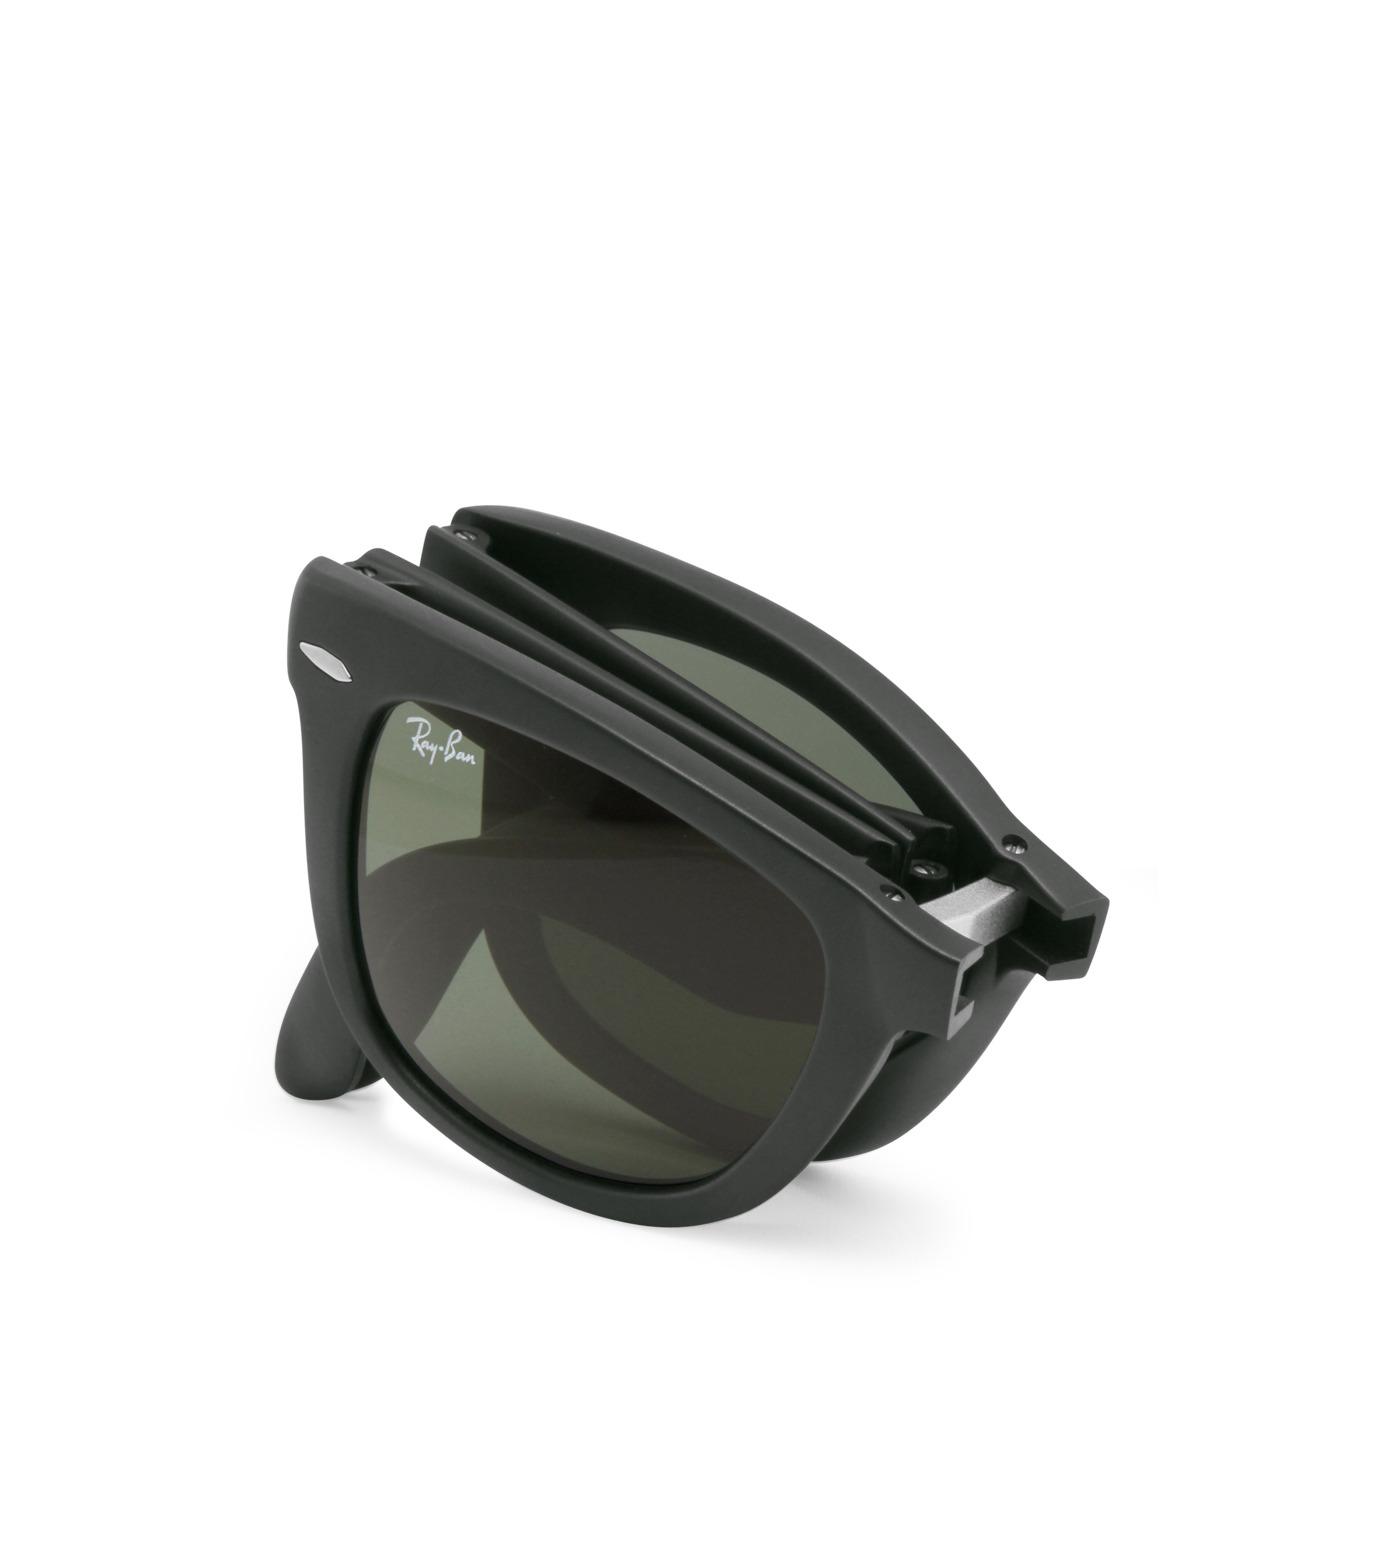 Ray-Ban(レイバン)のWayfarer Matte Black-CHARCHOL GRAY(アイウェア/eyewear)-BR-4105-12 拡大詳細画像4